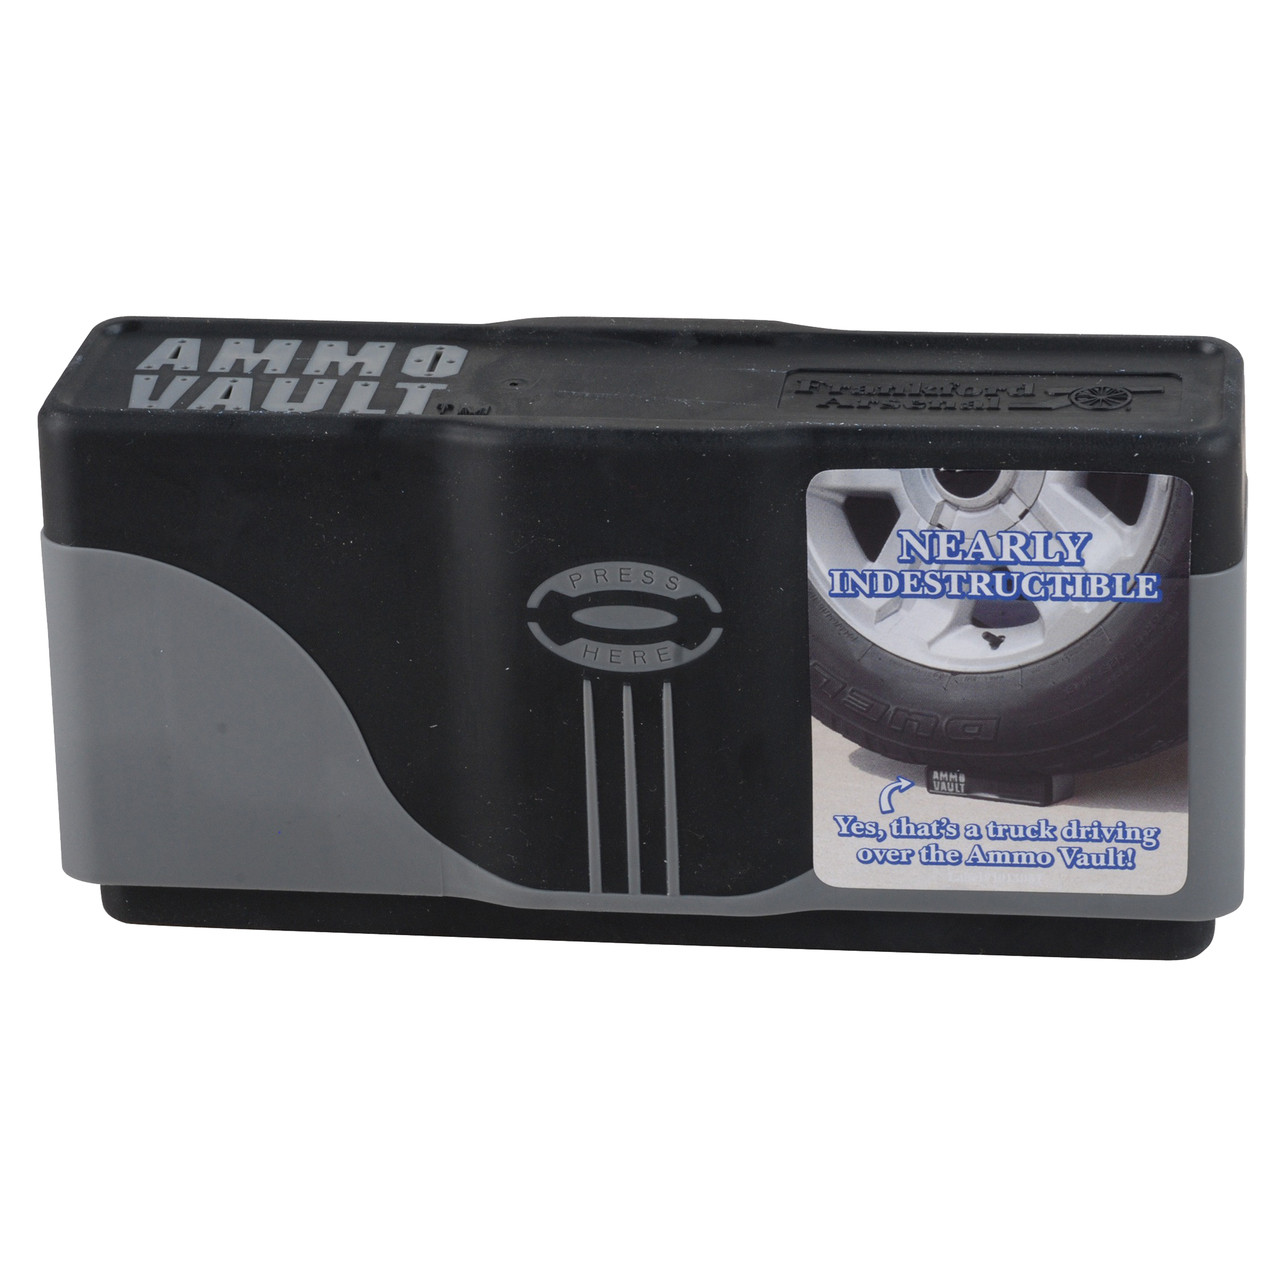 Frankford Arsenal Ammo Vault Slip-Top Locking Ammo Box #RMD-20 223  Remington, 308 Winchester, 30-06 Springfield 20-Round Plastic Gray and  Black, UPC